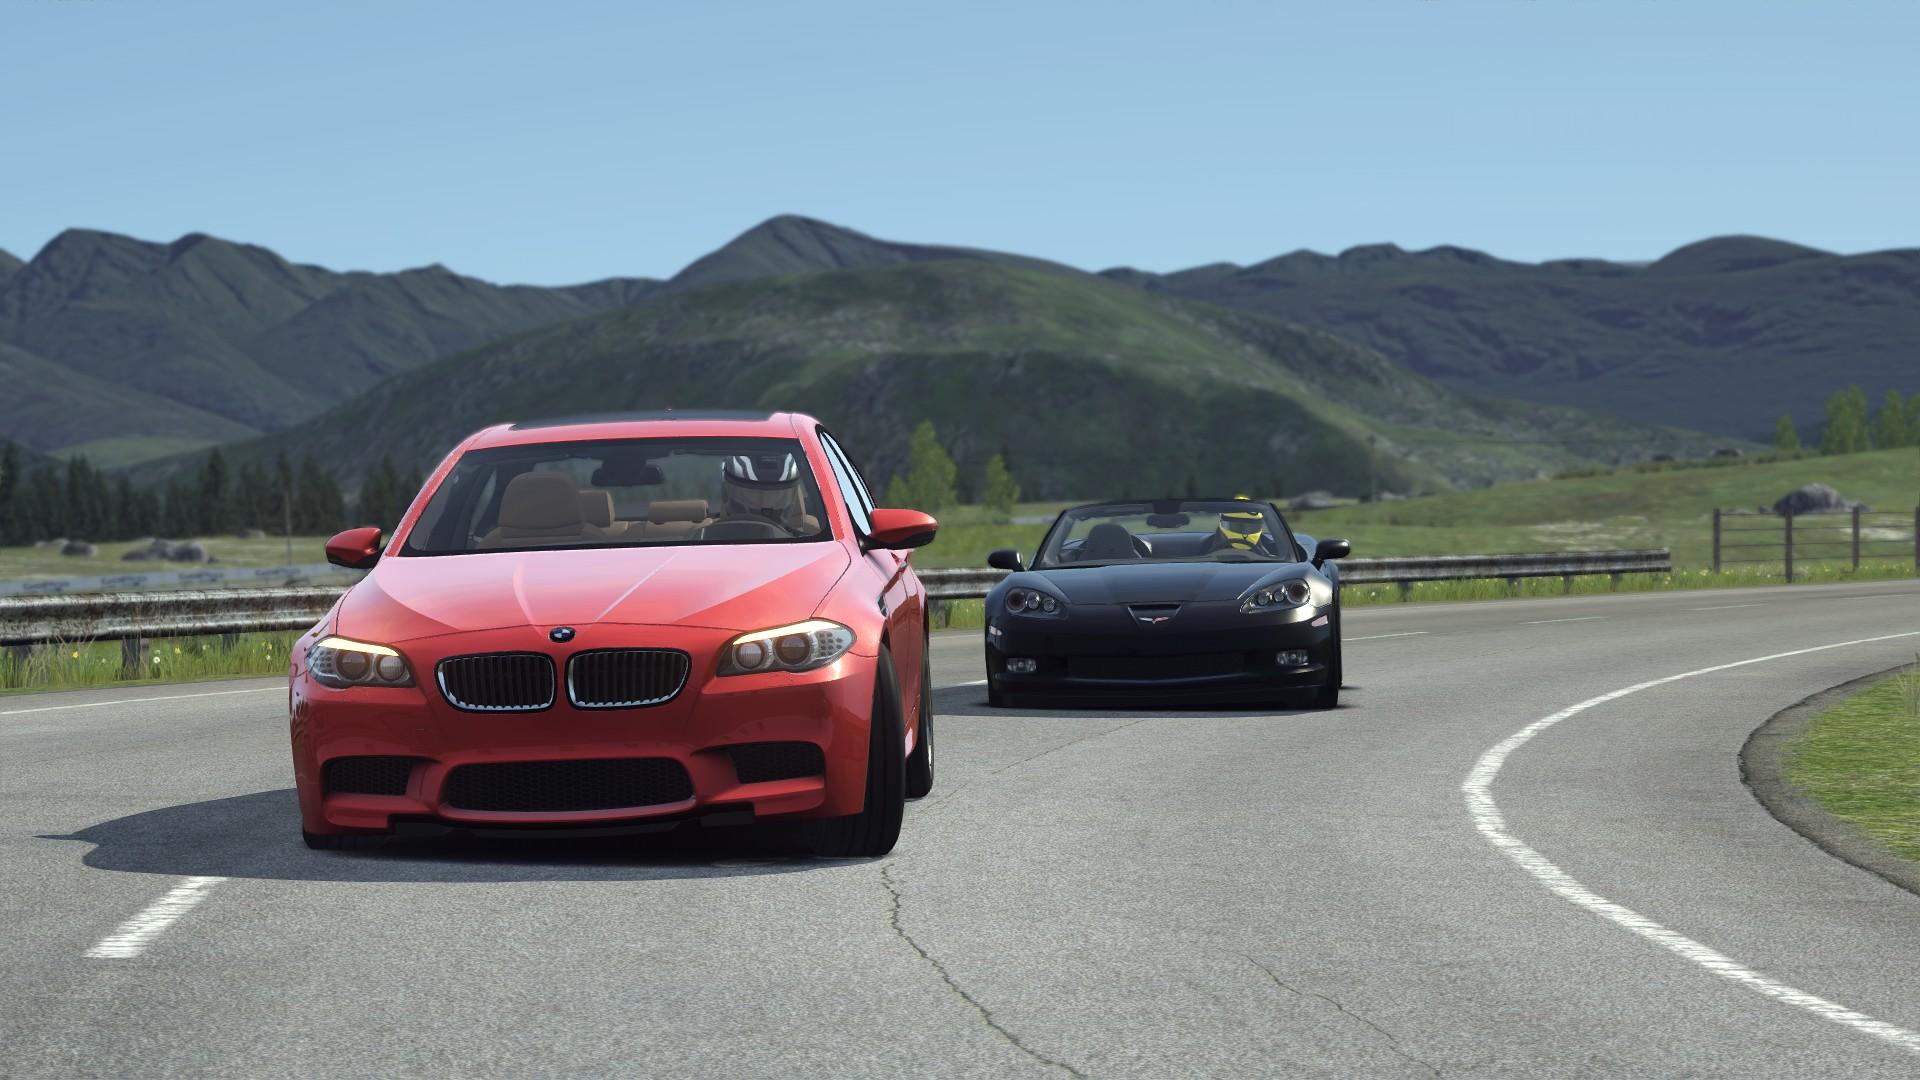 BMW M5 F10 Assetto Corsa 1.14 009.jpg